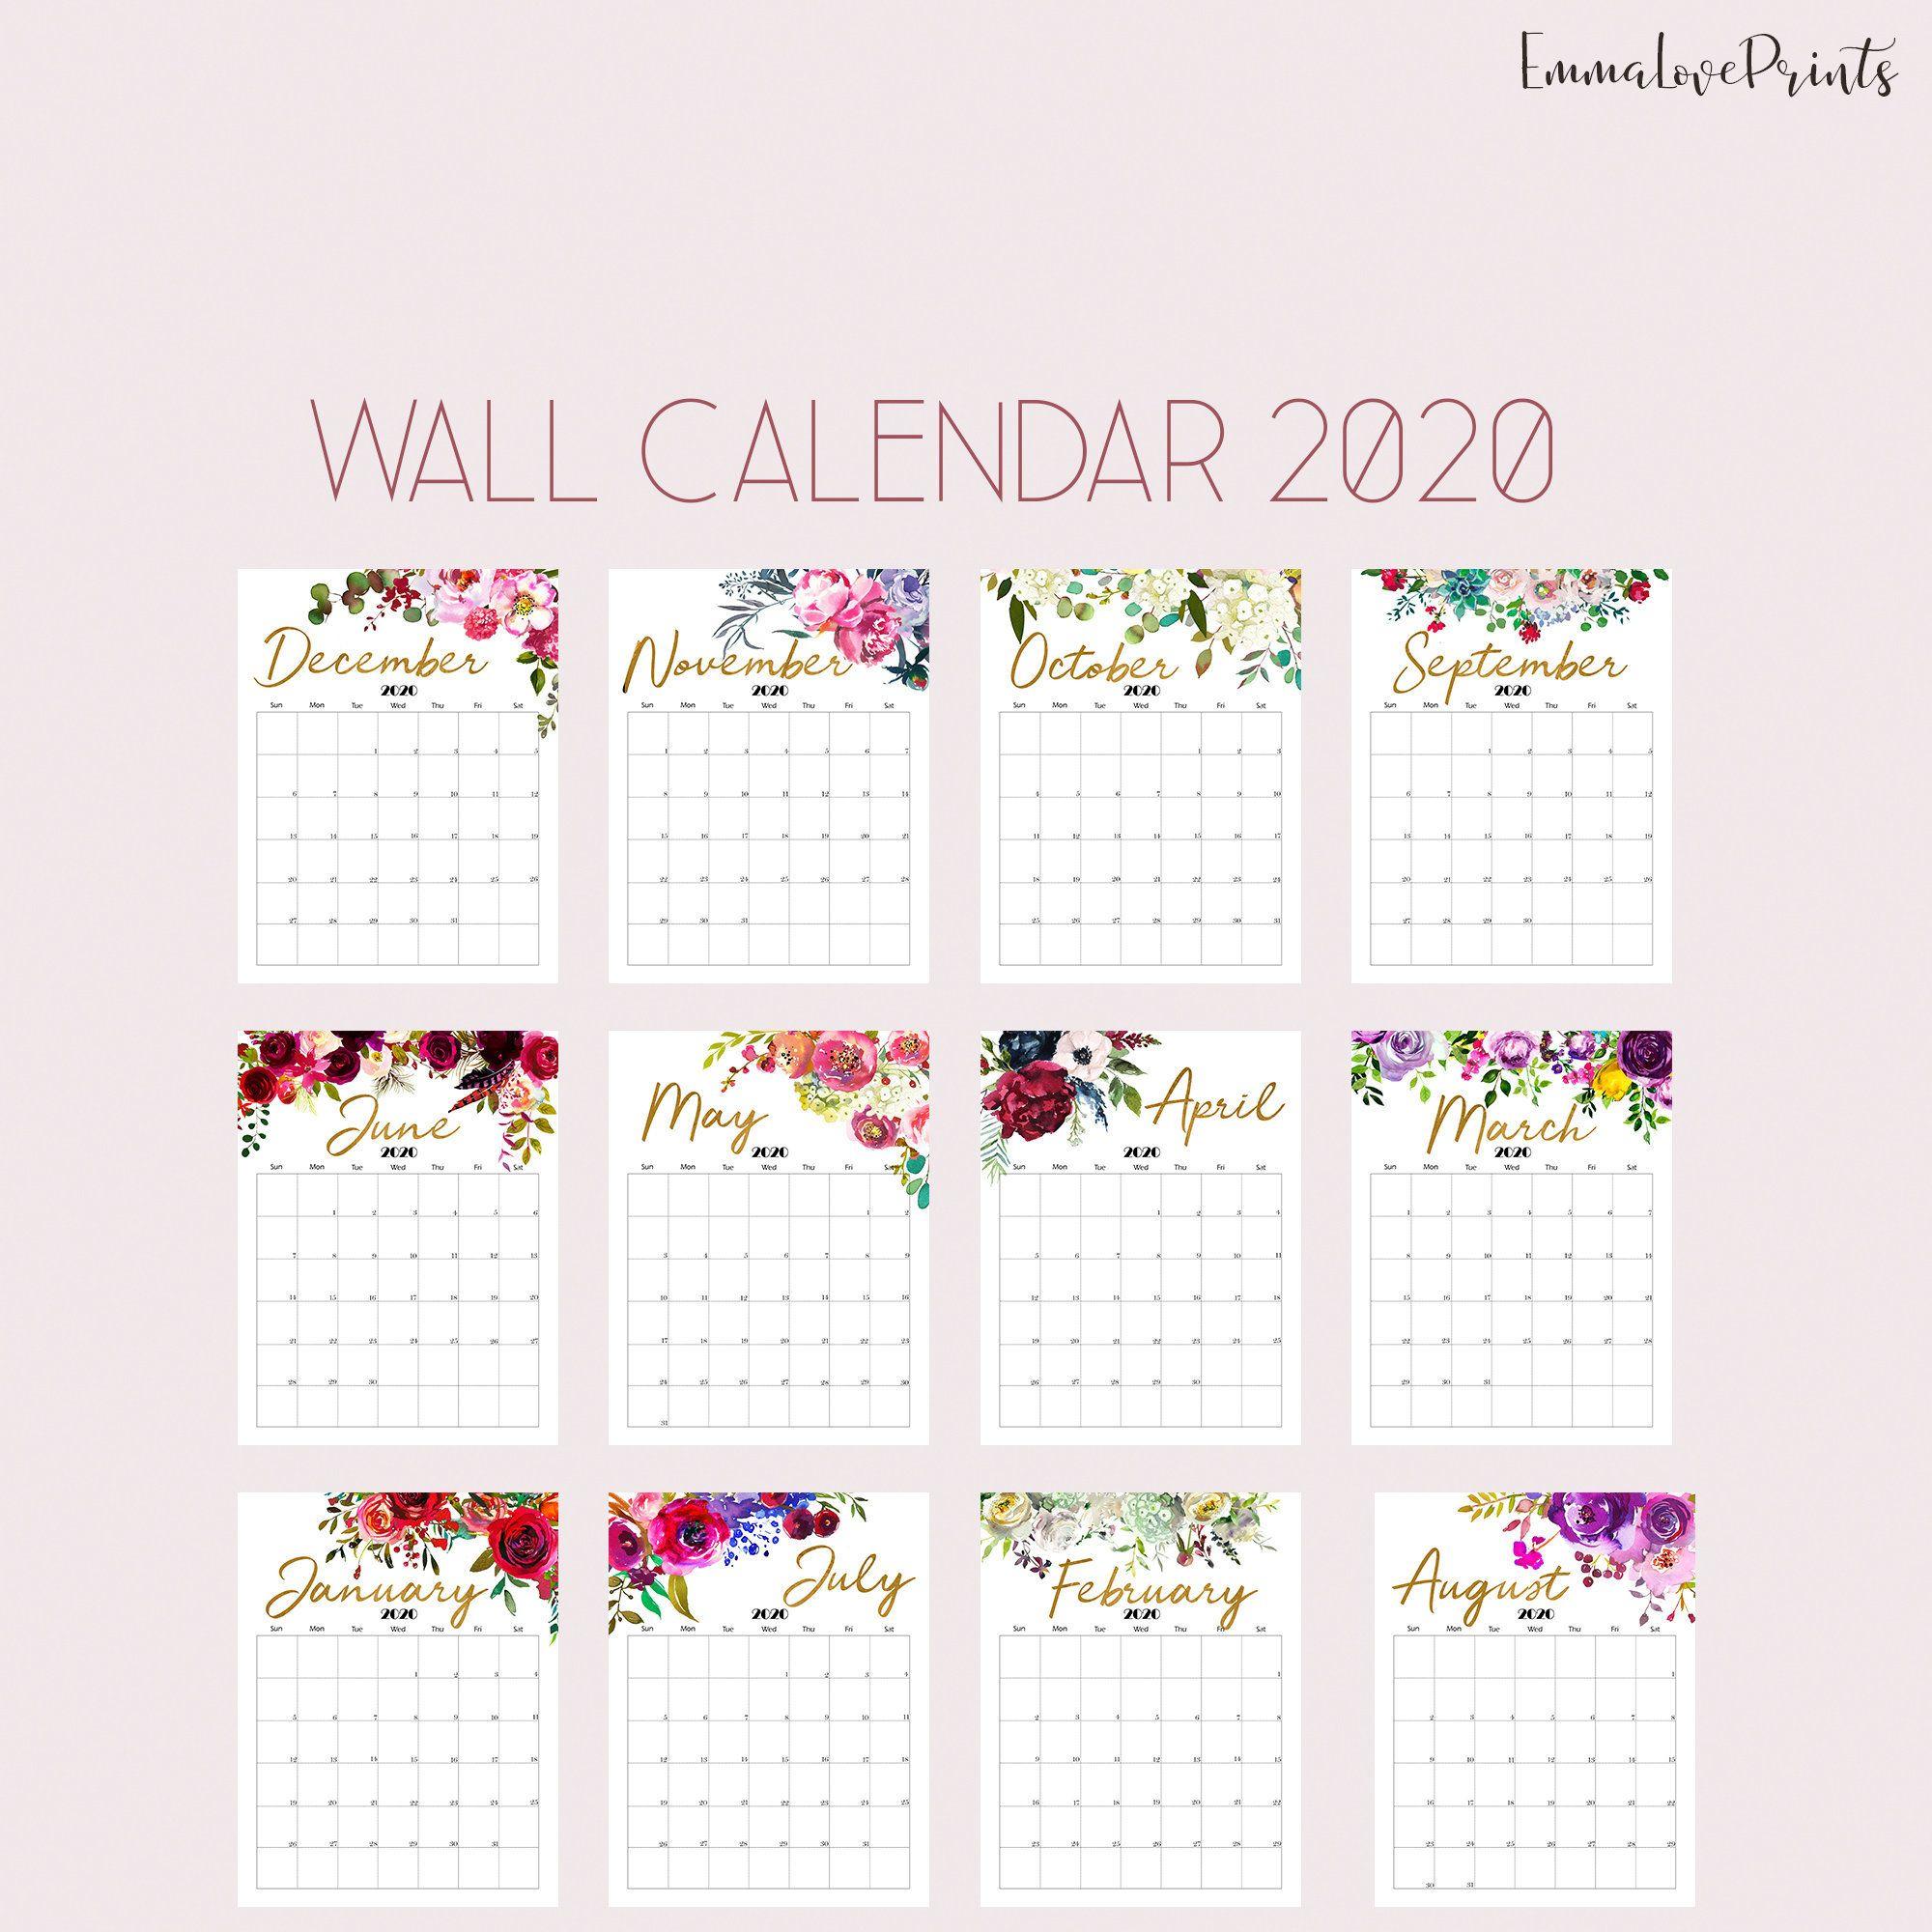 Printable Calendar 2020 Wall Calendar 2020 Desk Calendar, Floral throughout 2020 Printable Calendar With Sunday And Saturday Pink Color